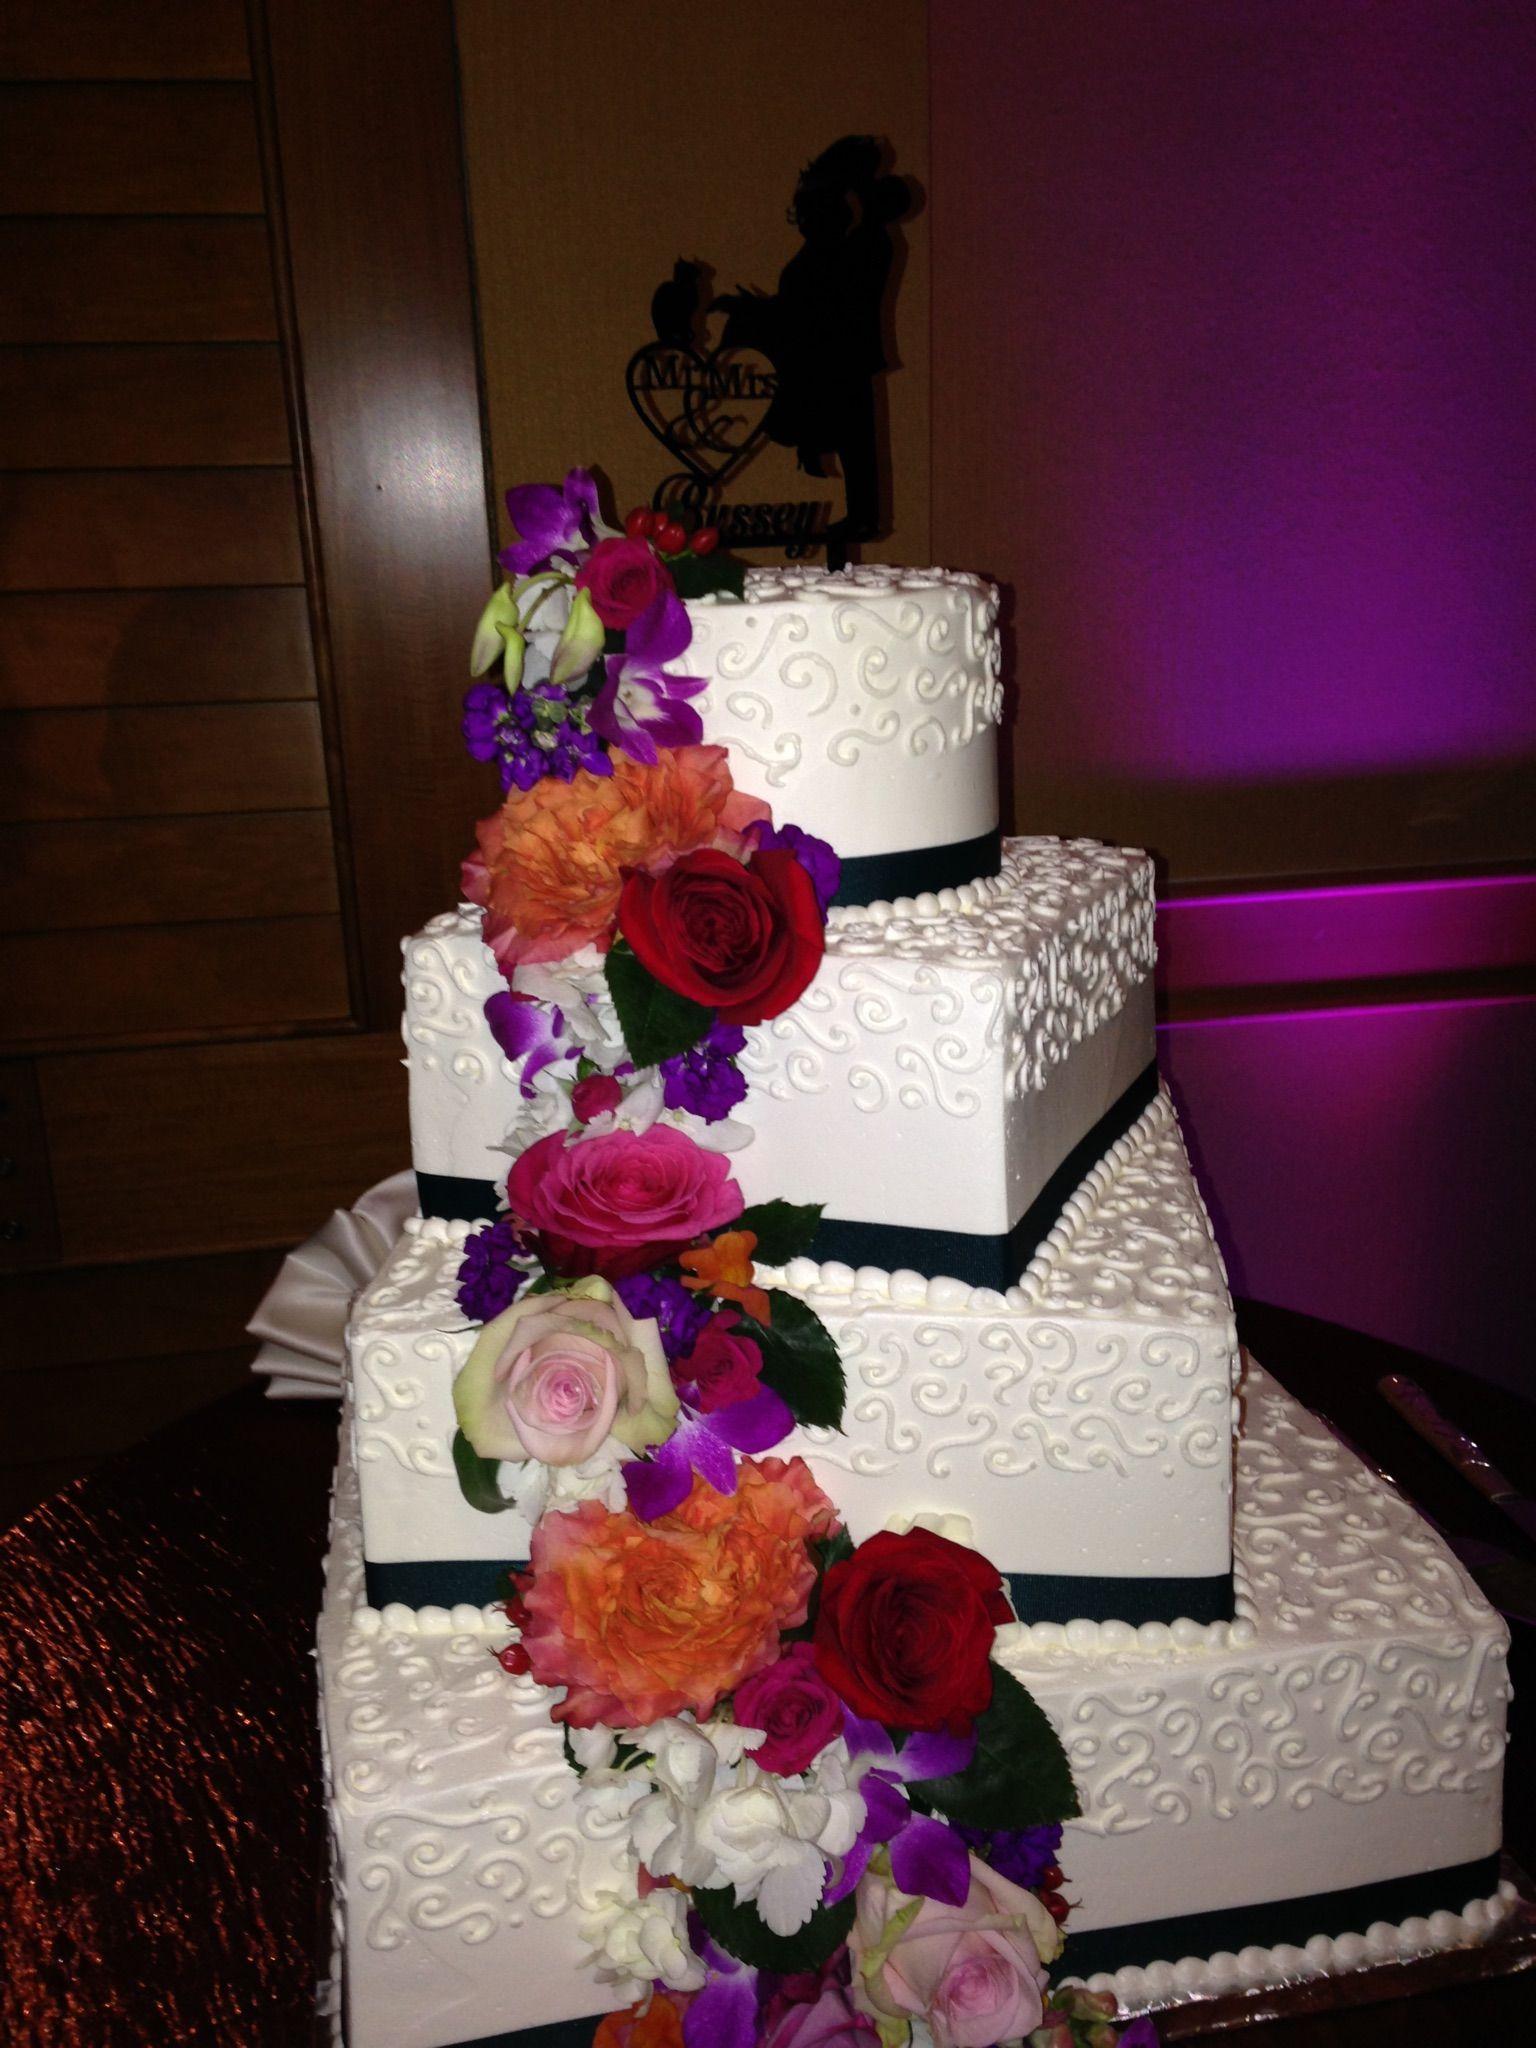 Gorgeous Wedding Cake Prepared By A Local Bakery Julie Bakes Hyattchesapeakebay